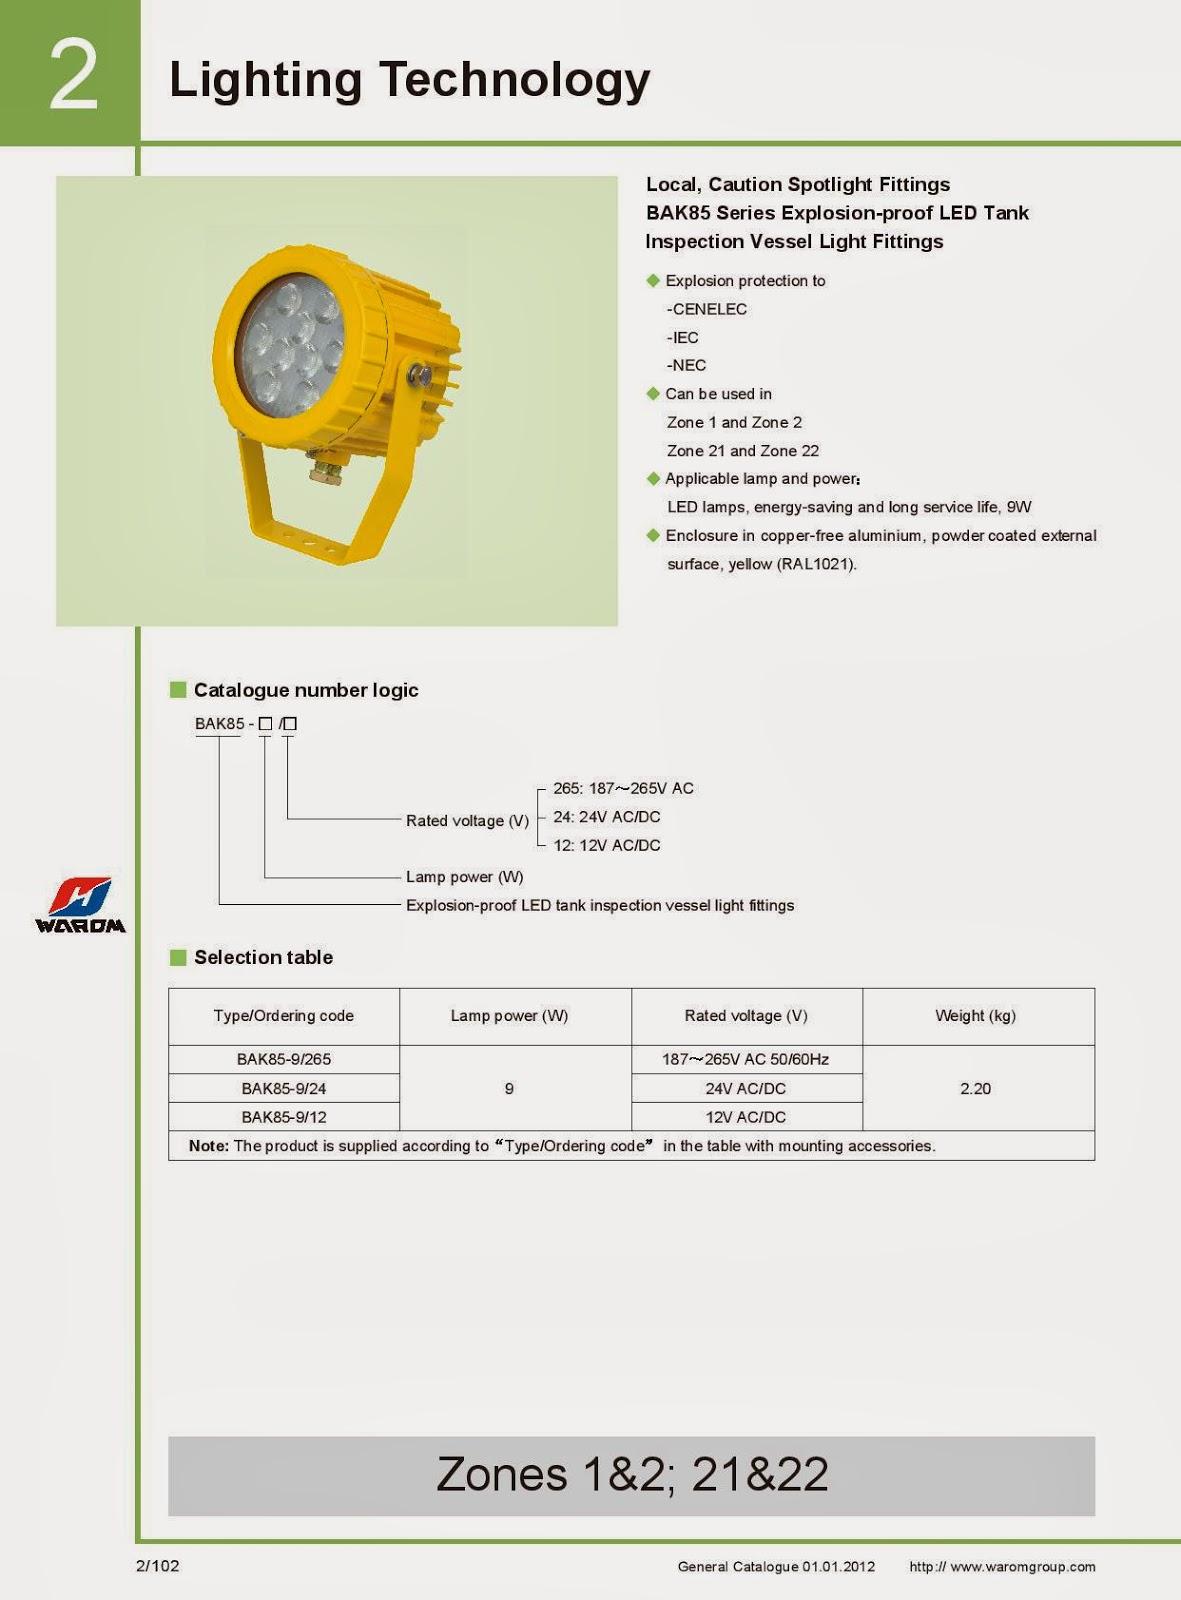 Jual Lampu Sorot Kapal Explosion Proof Led Wiring Diagram Warom Bak 85 Series 1